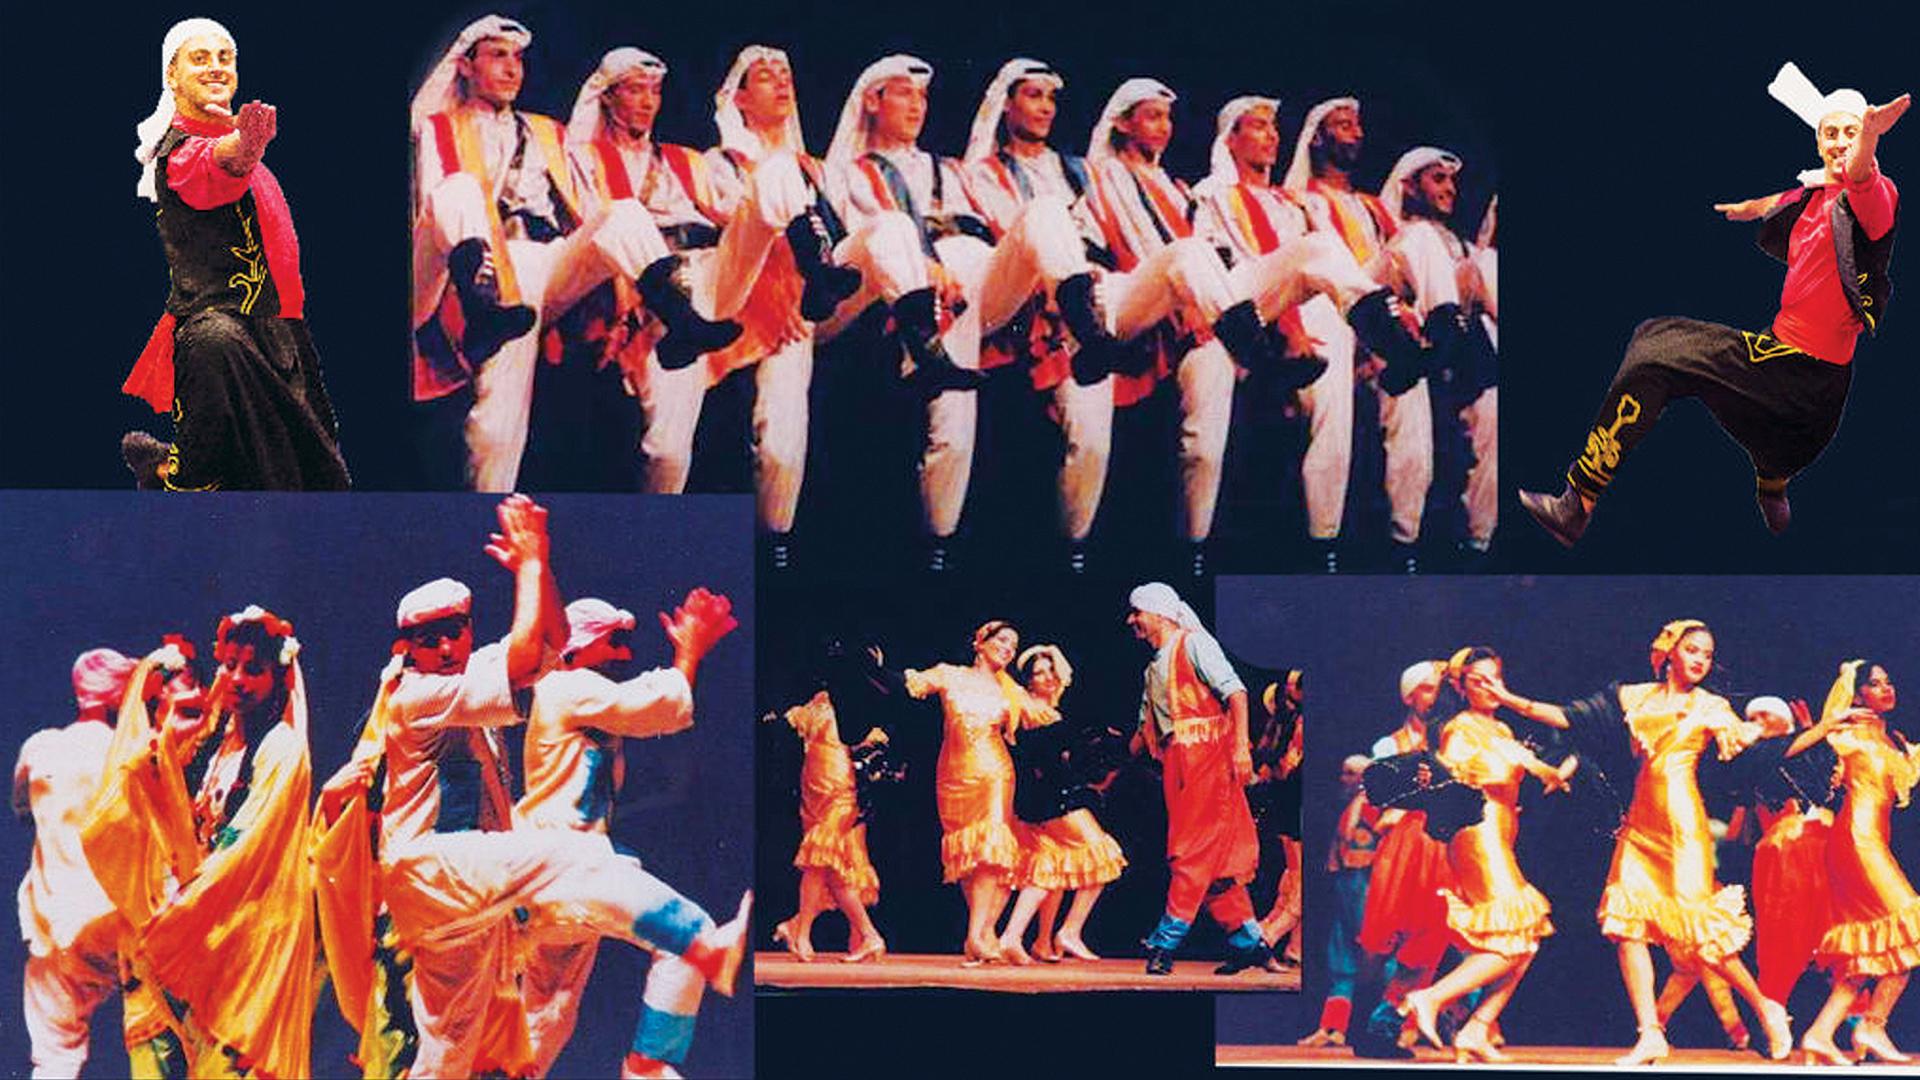 The Alexandria Folk Dance Troupe of Egypt